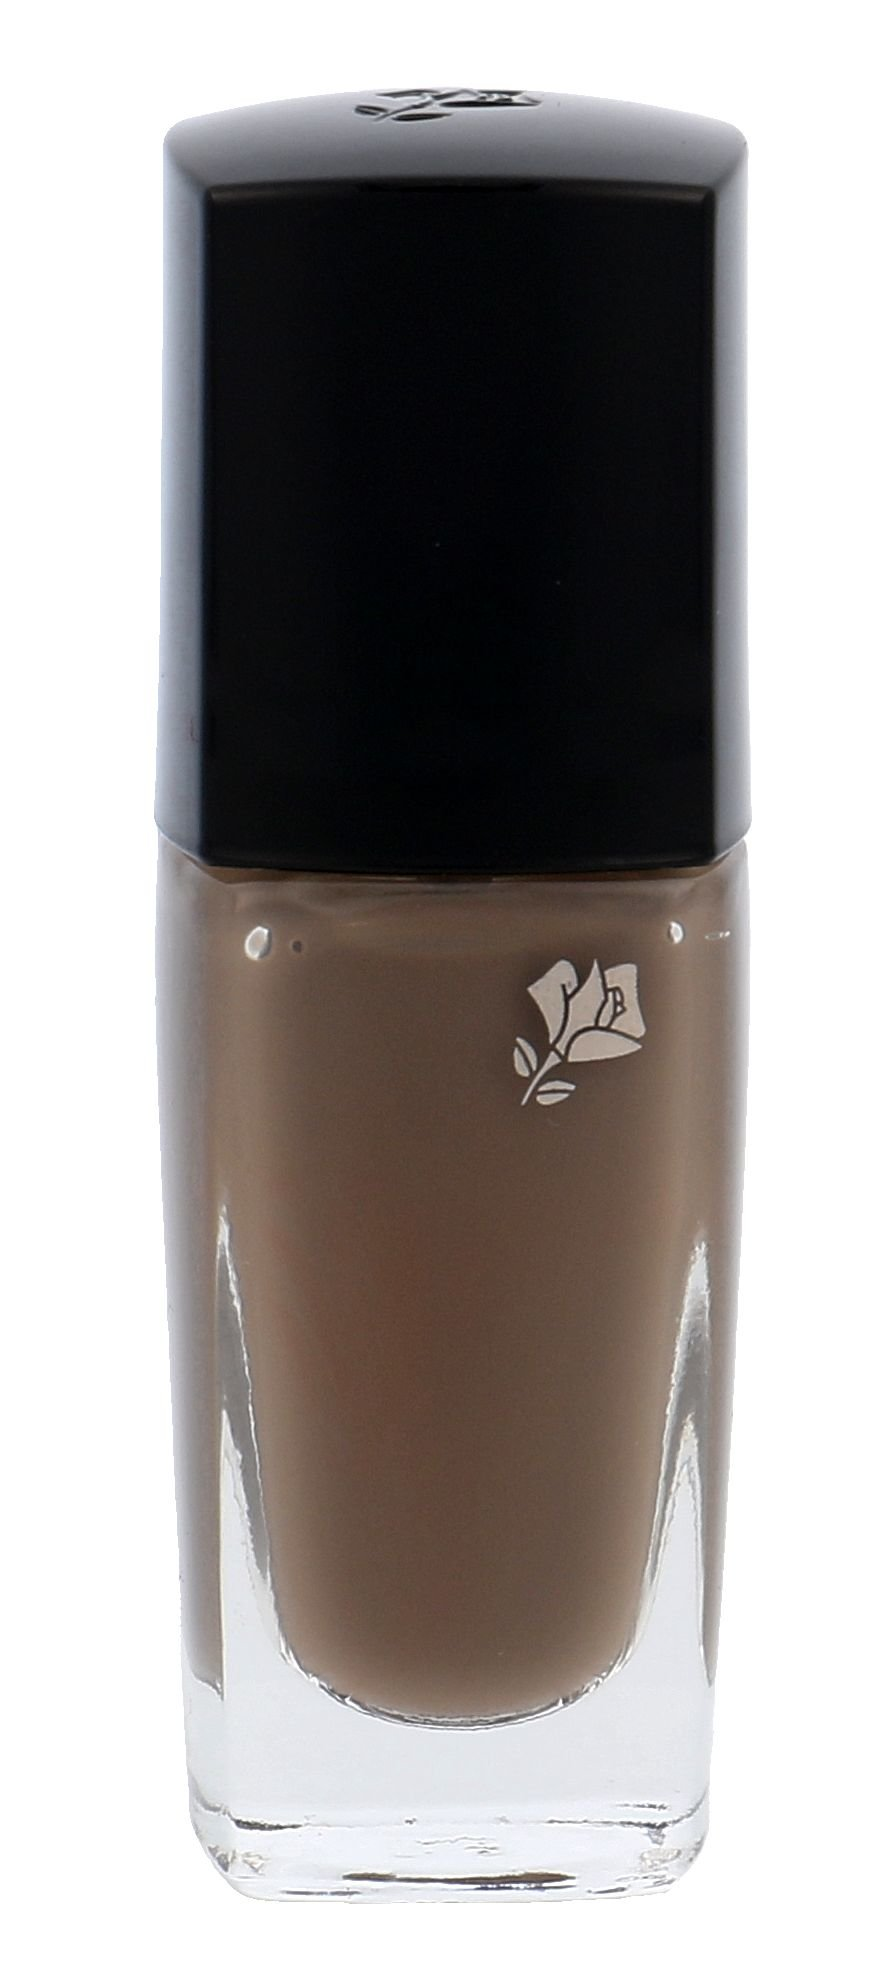 Lancôme Vernis In Love Cosmetic 6ml 280N Cosmopolitan Kaki